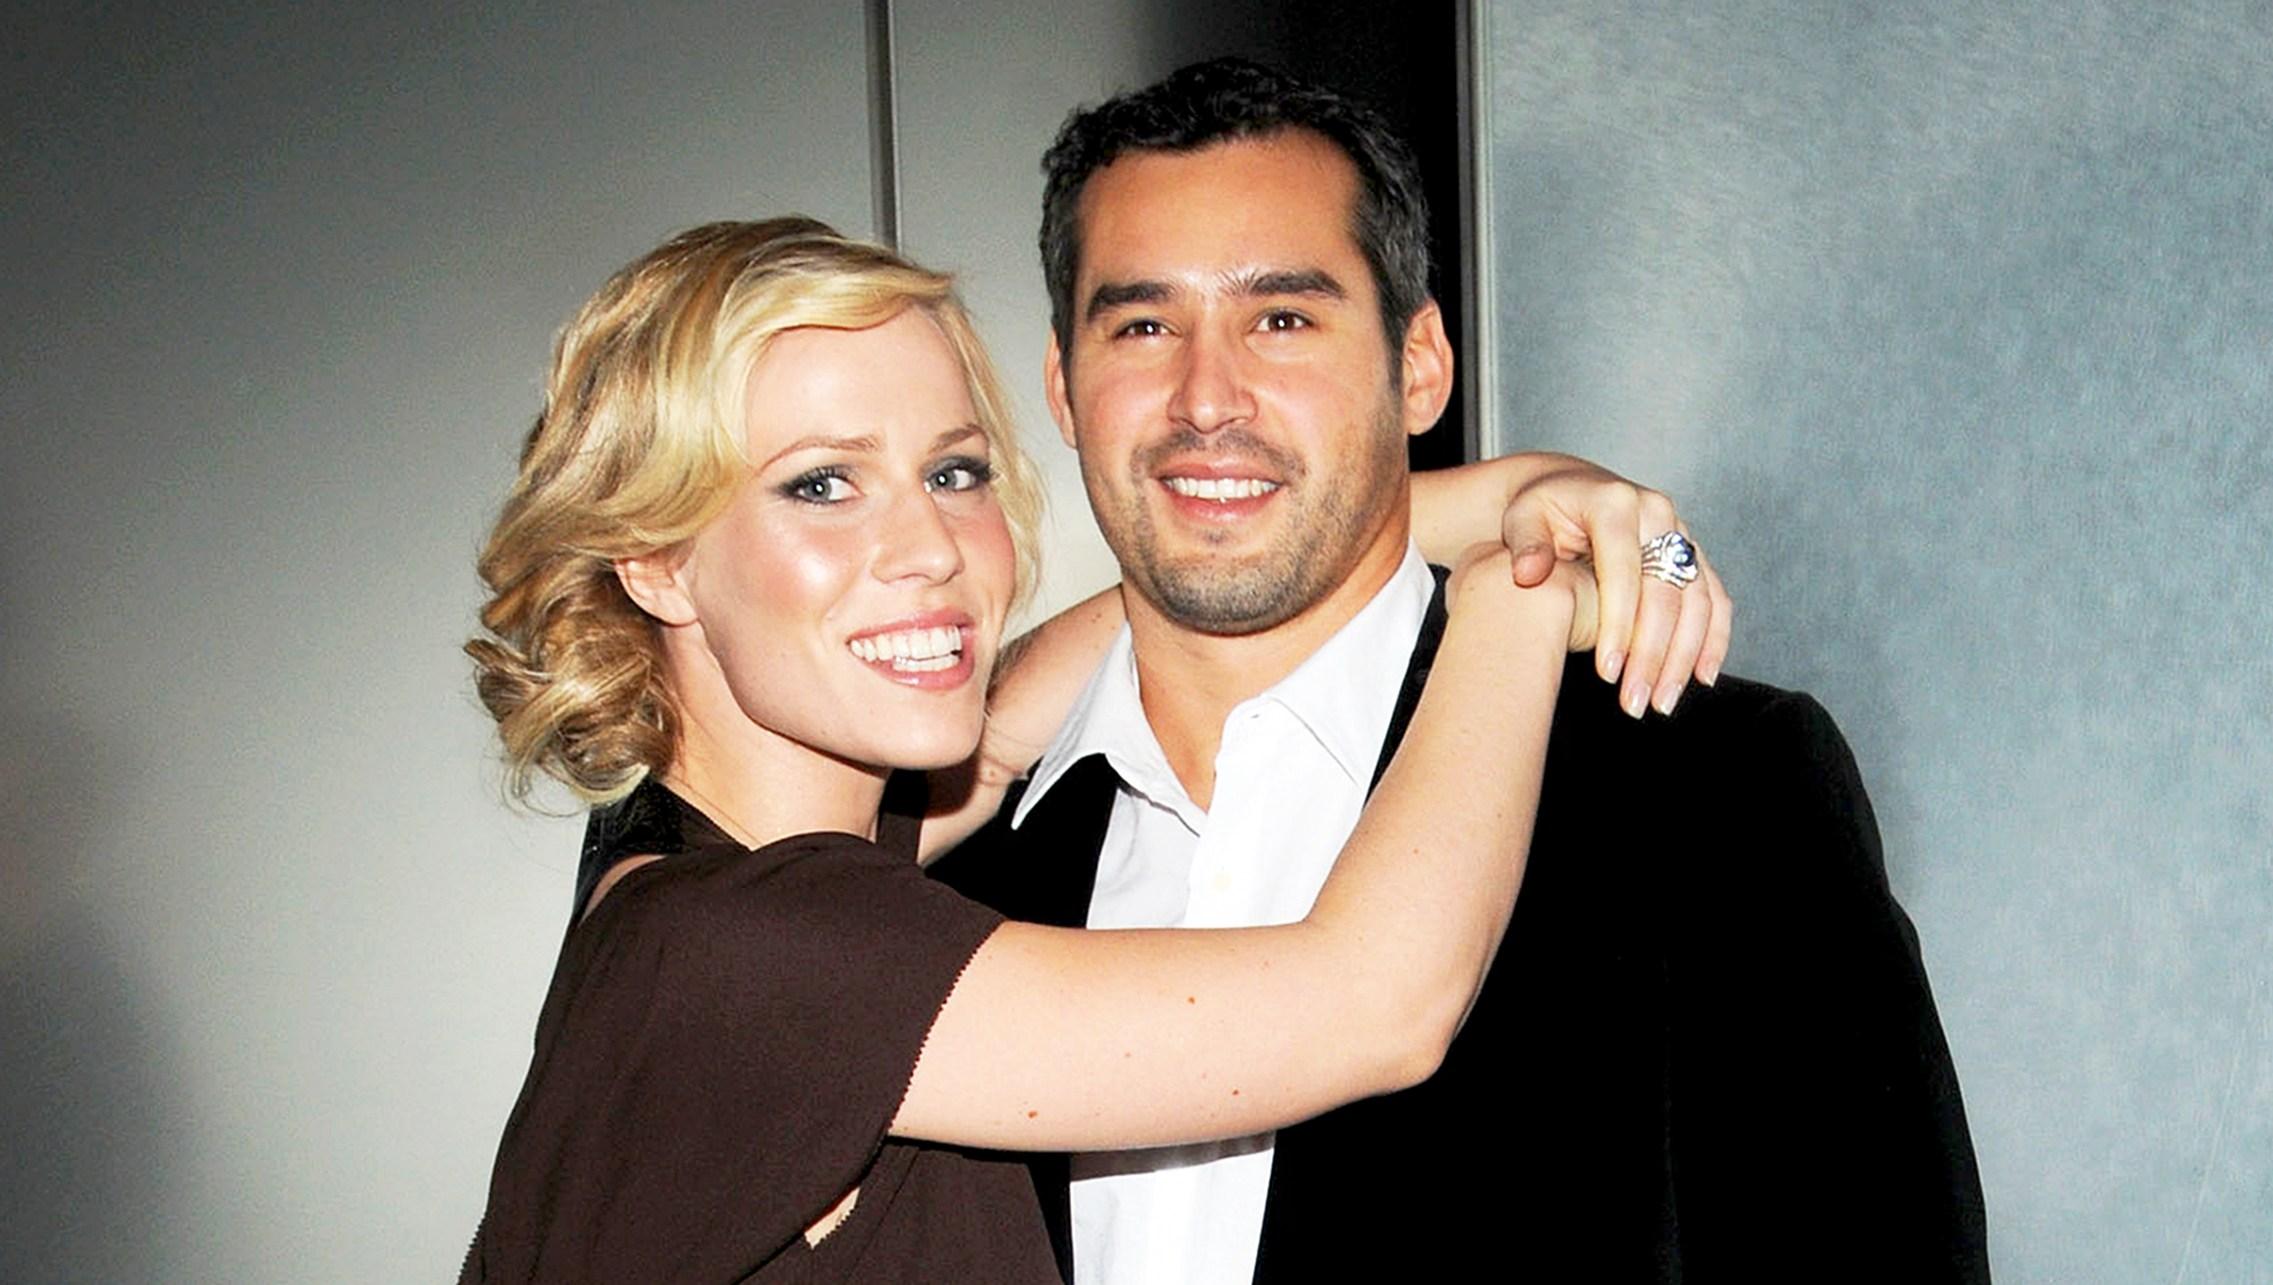 Natasha Bedingfield Gives Birth Welcomes First Child With Husband Matt Robinson